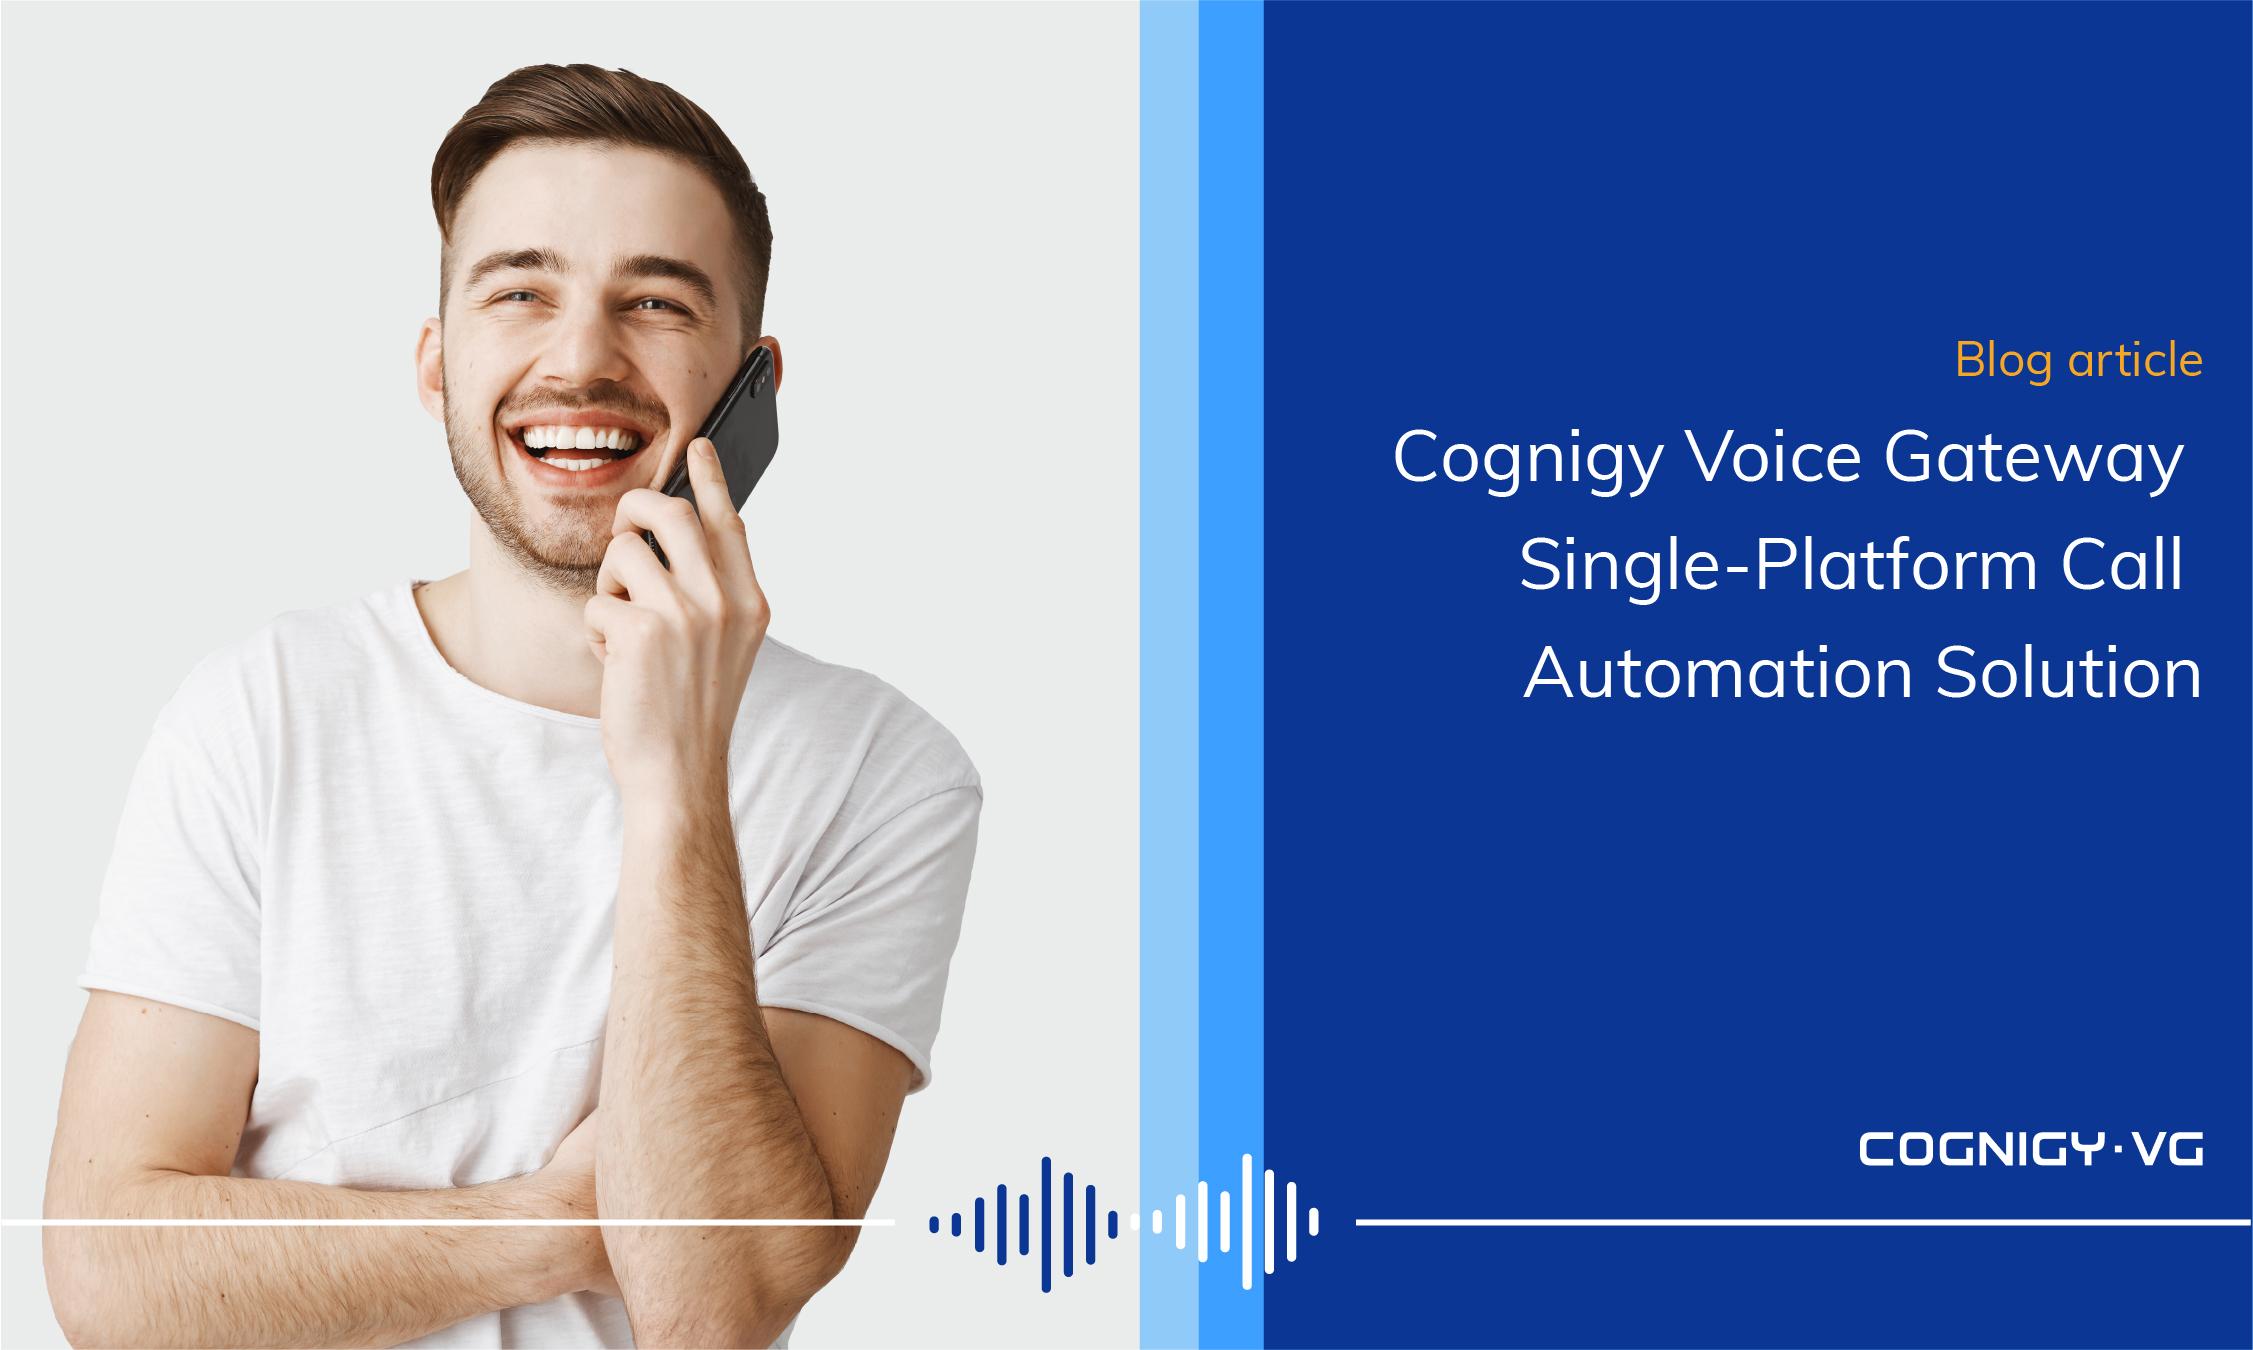 cognigy voice gateway automation cover